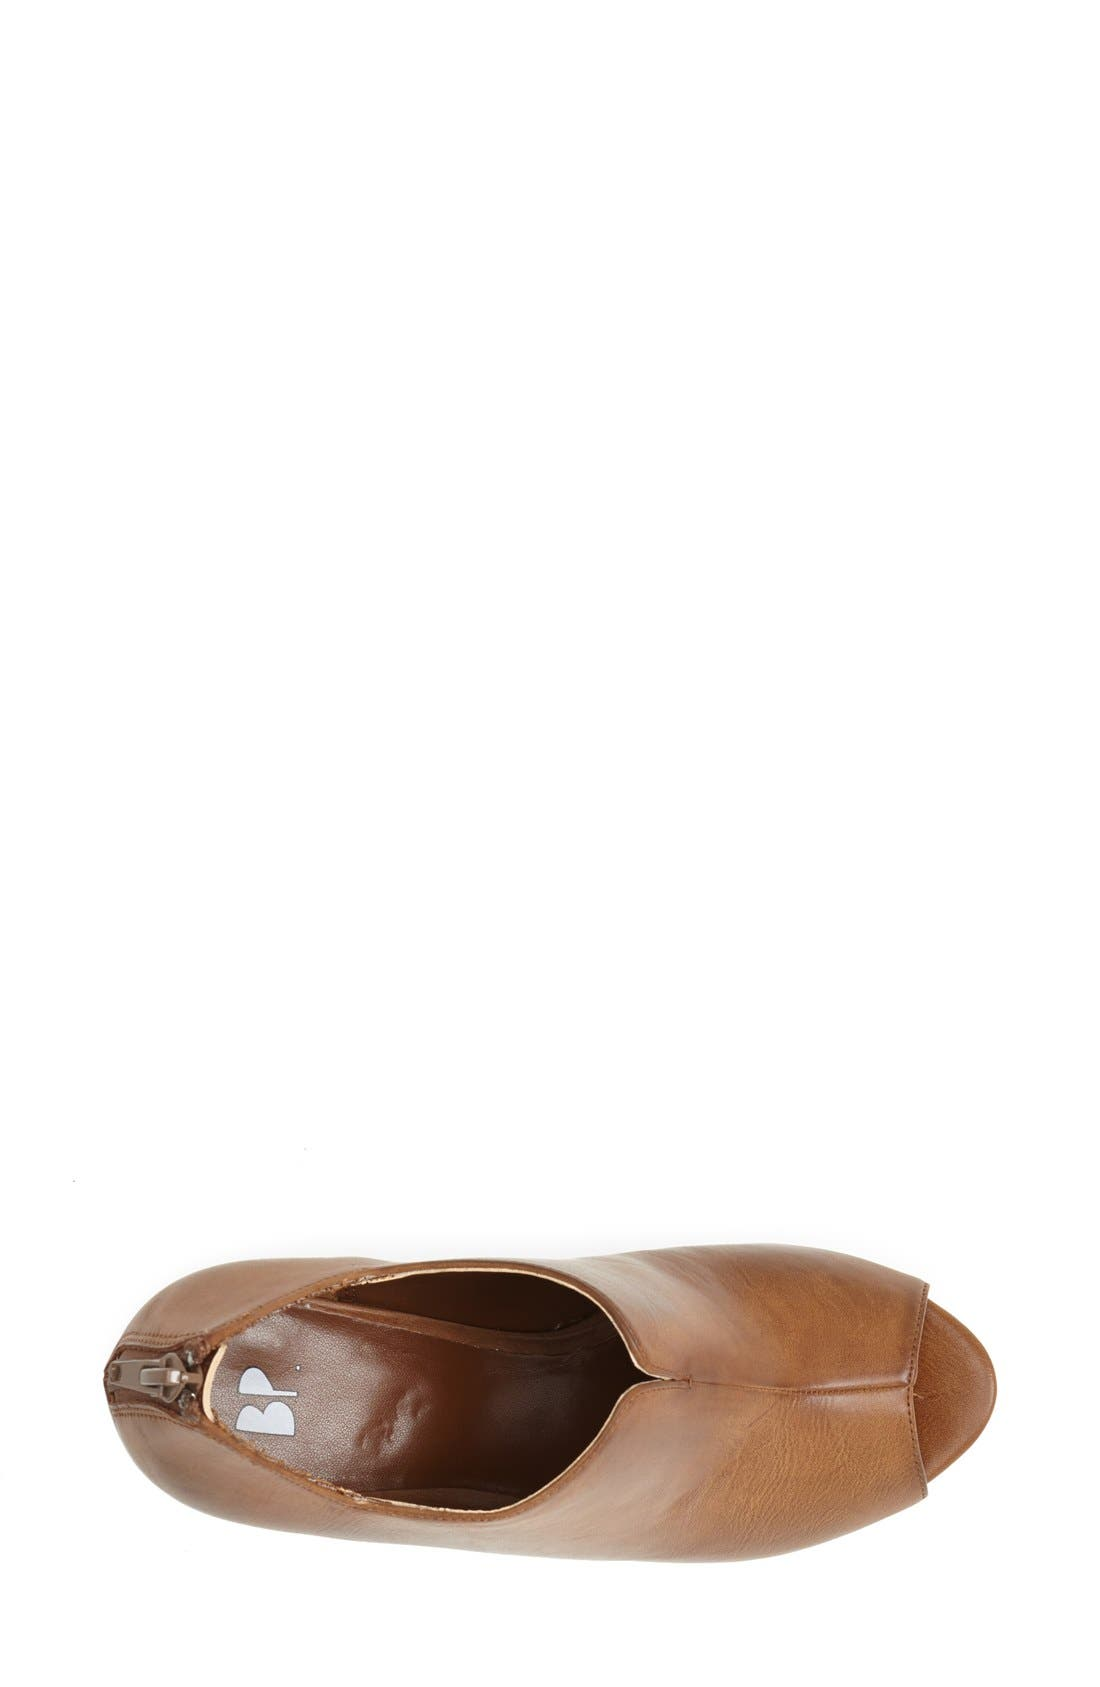 'Run Around' Wedge Sandal,                             Alternate thumbnail 3, color,                             Cognac